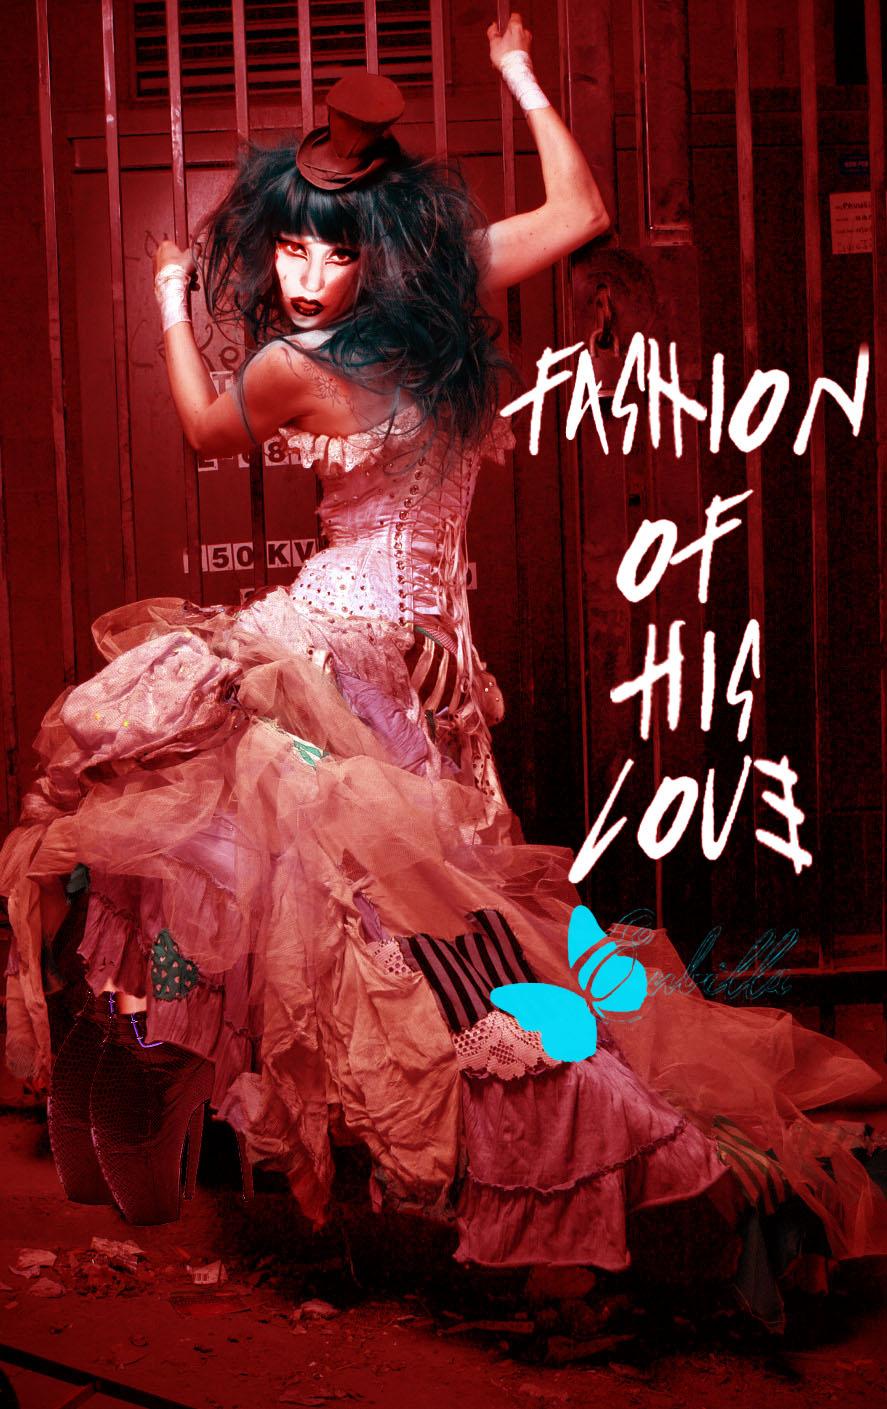 Lady Gaga's meat dress - Wikipedia Fashion of his love lady gaga